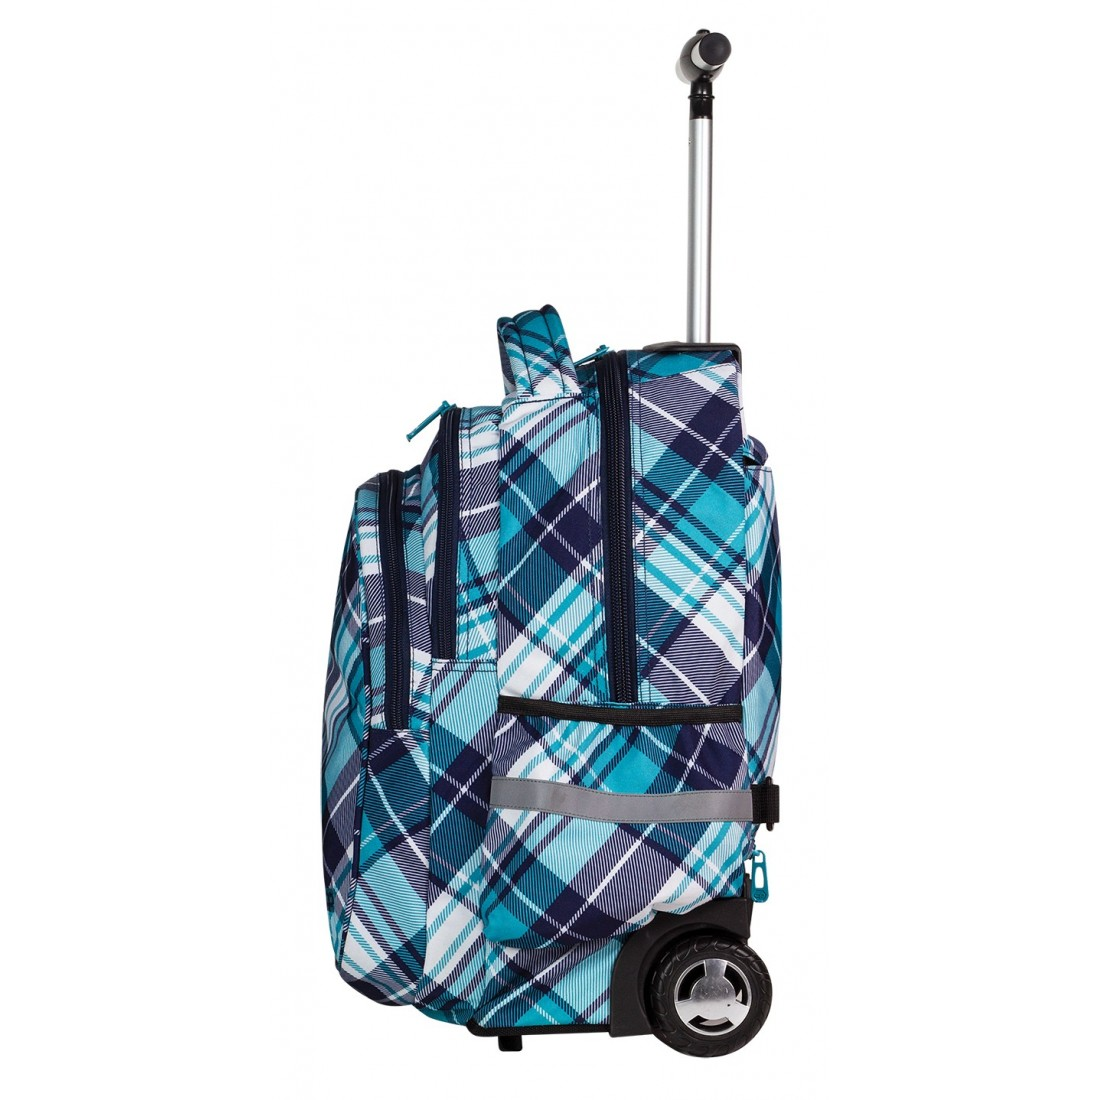 Plecak na kółkach CoolPack Junior DERRICK CP 503 - plecak-tornister.pl